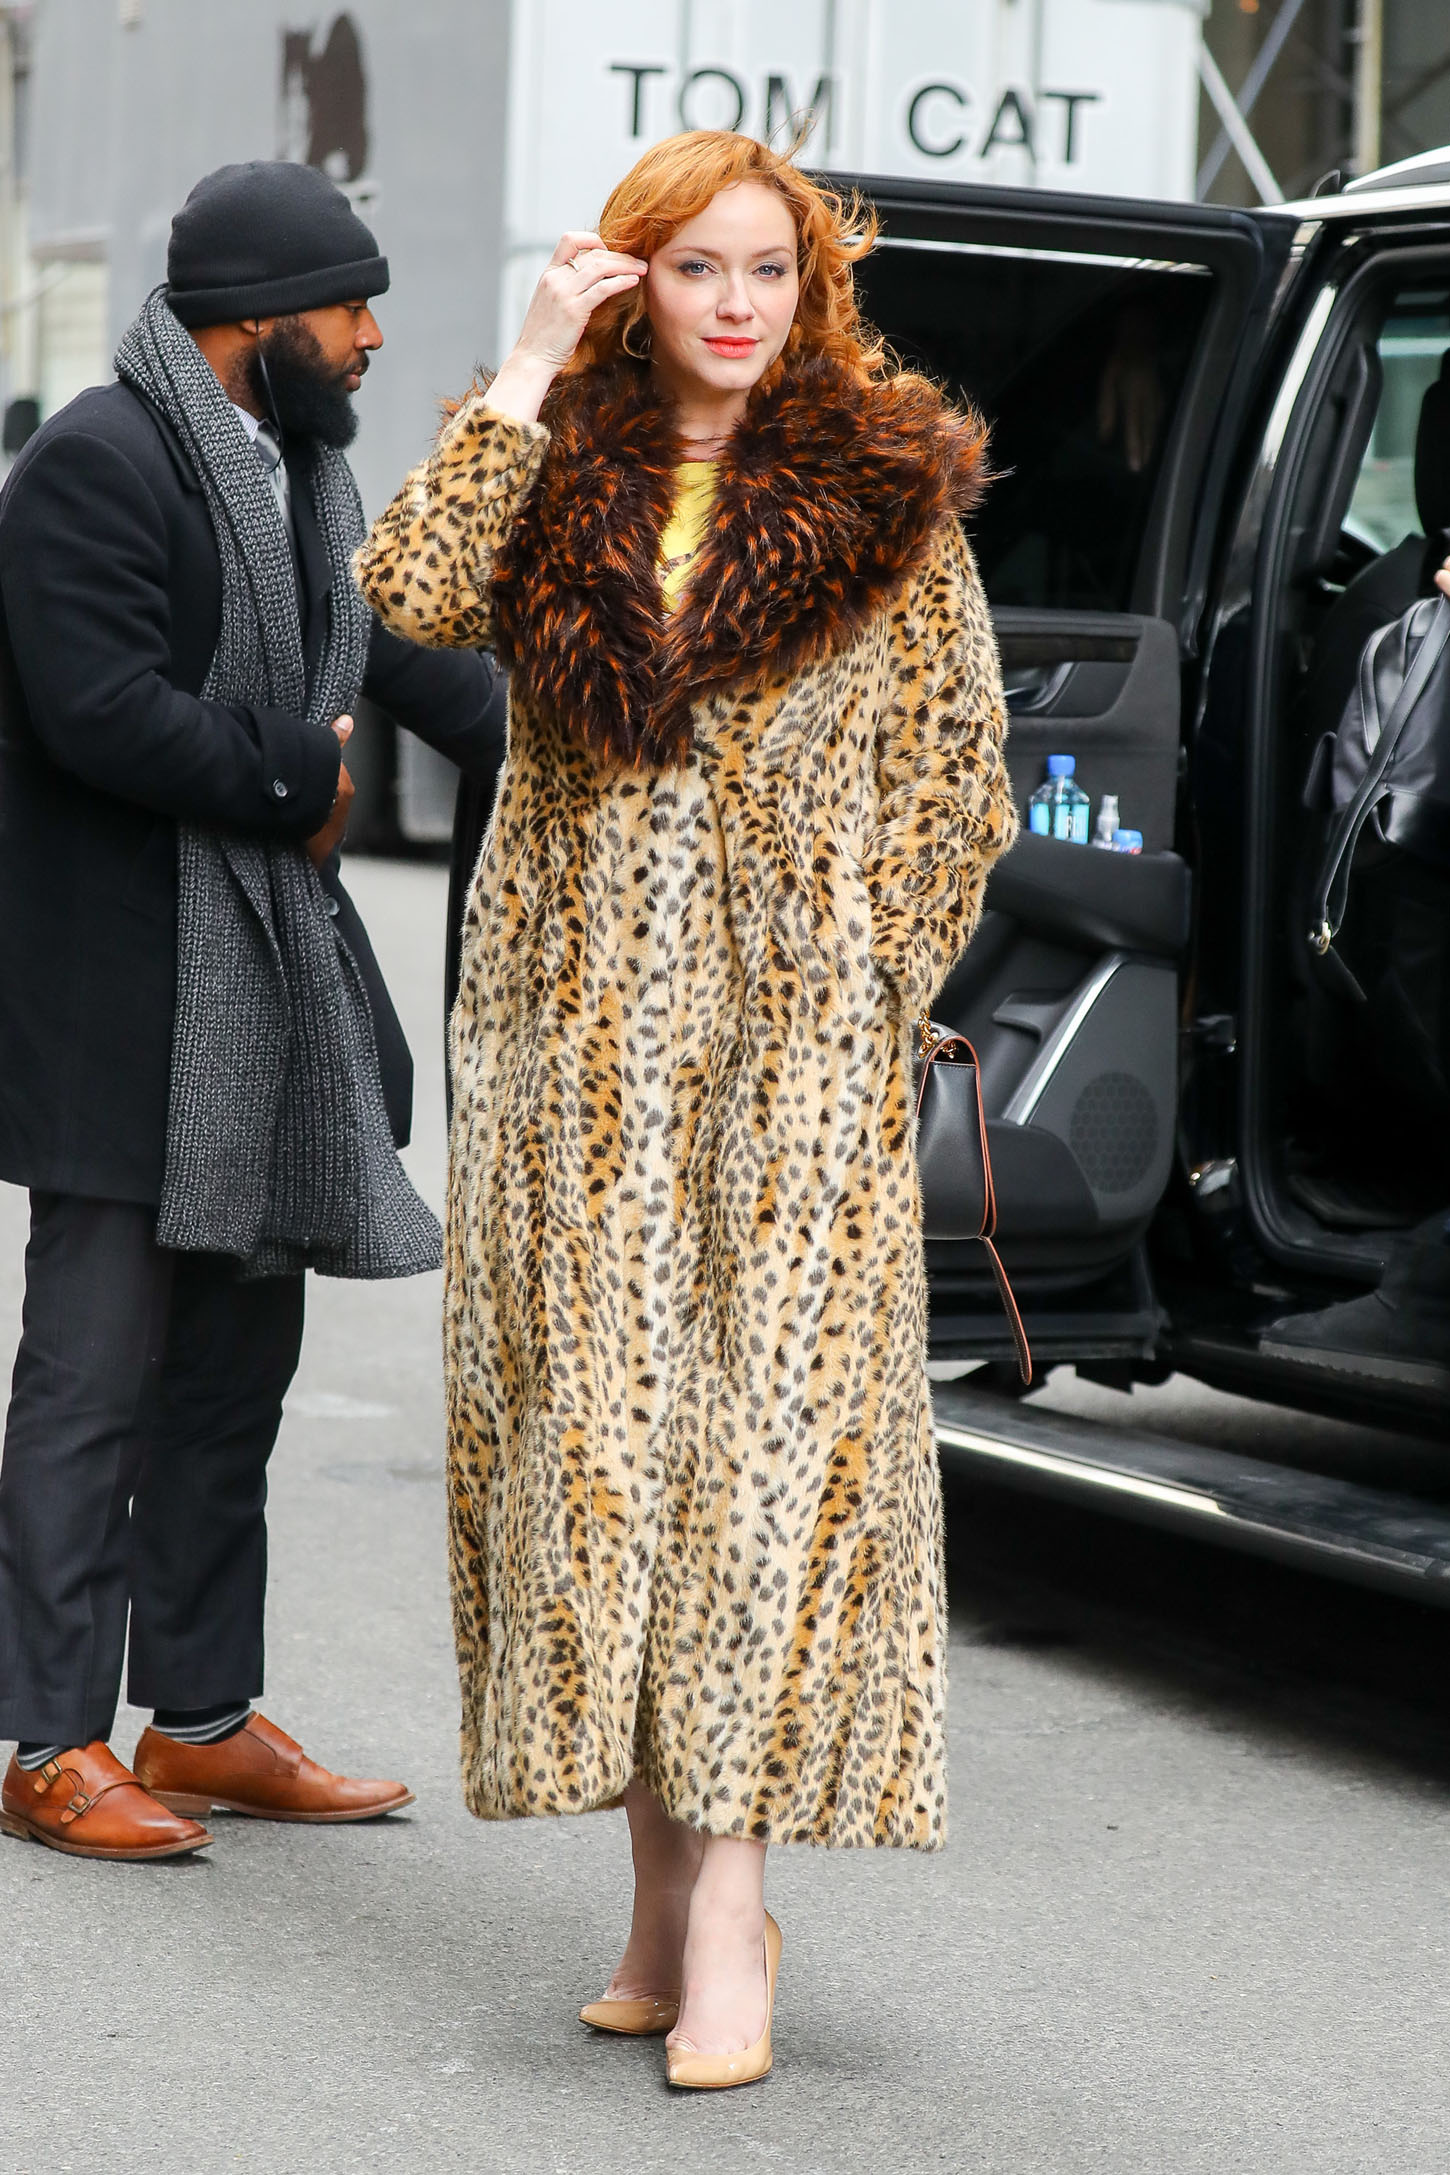 Christina Hendricks spotted wearing a leopard print coat in a cold day in New York City <P> Pictured: Christina Hendricks <B>Ref: SPL1637014  131217  </B><BR/> Picture by: Felipe Ramales / Splash News<BR/> </P><P> <B>Splash News and Pictures</B><BR/> Los Angeles:310-821-2666<BR/> New York:212-619-2666<BR/> London:870-934-2666<BR/> <span id=